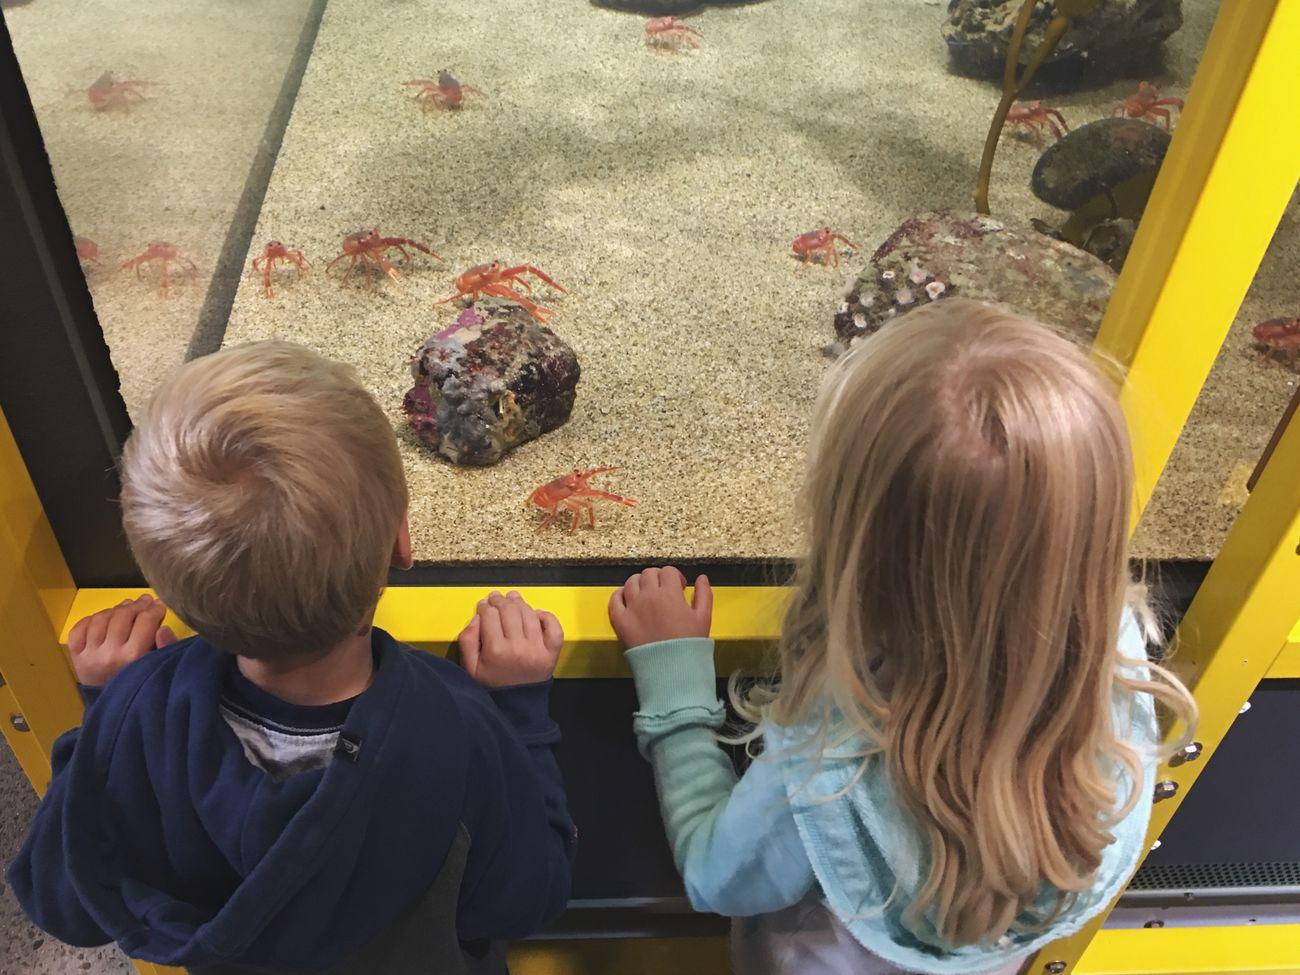 Aquarium Children Siblings Crabs Red Crab Learning Preschoolers Seymour Marine Center Santa Cruz California United States Two Is Better Than One